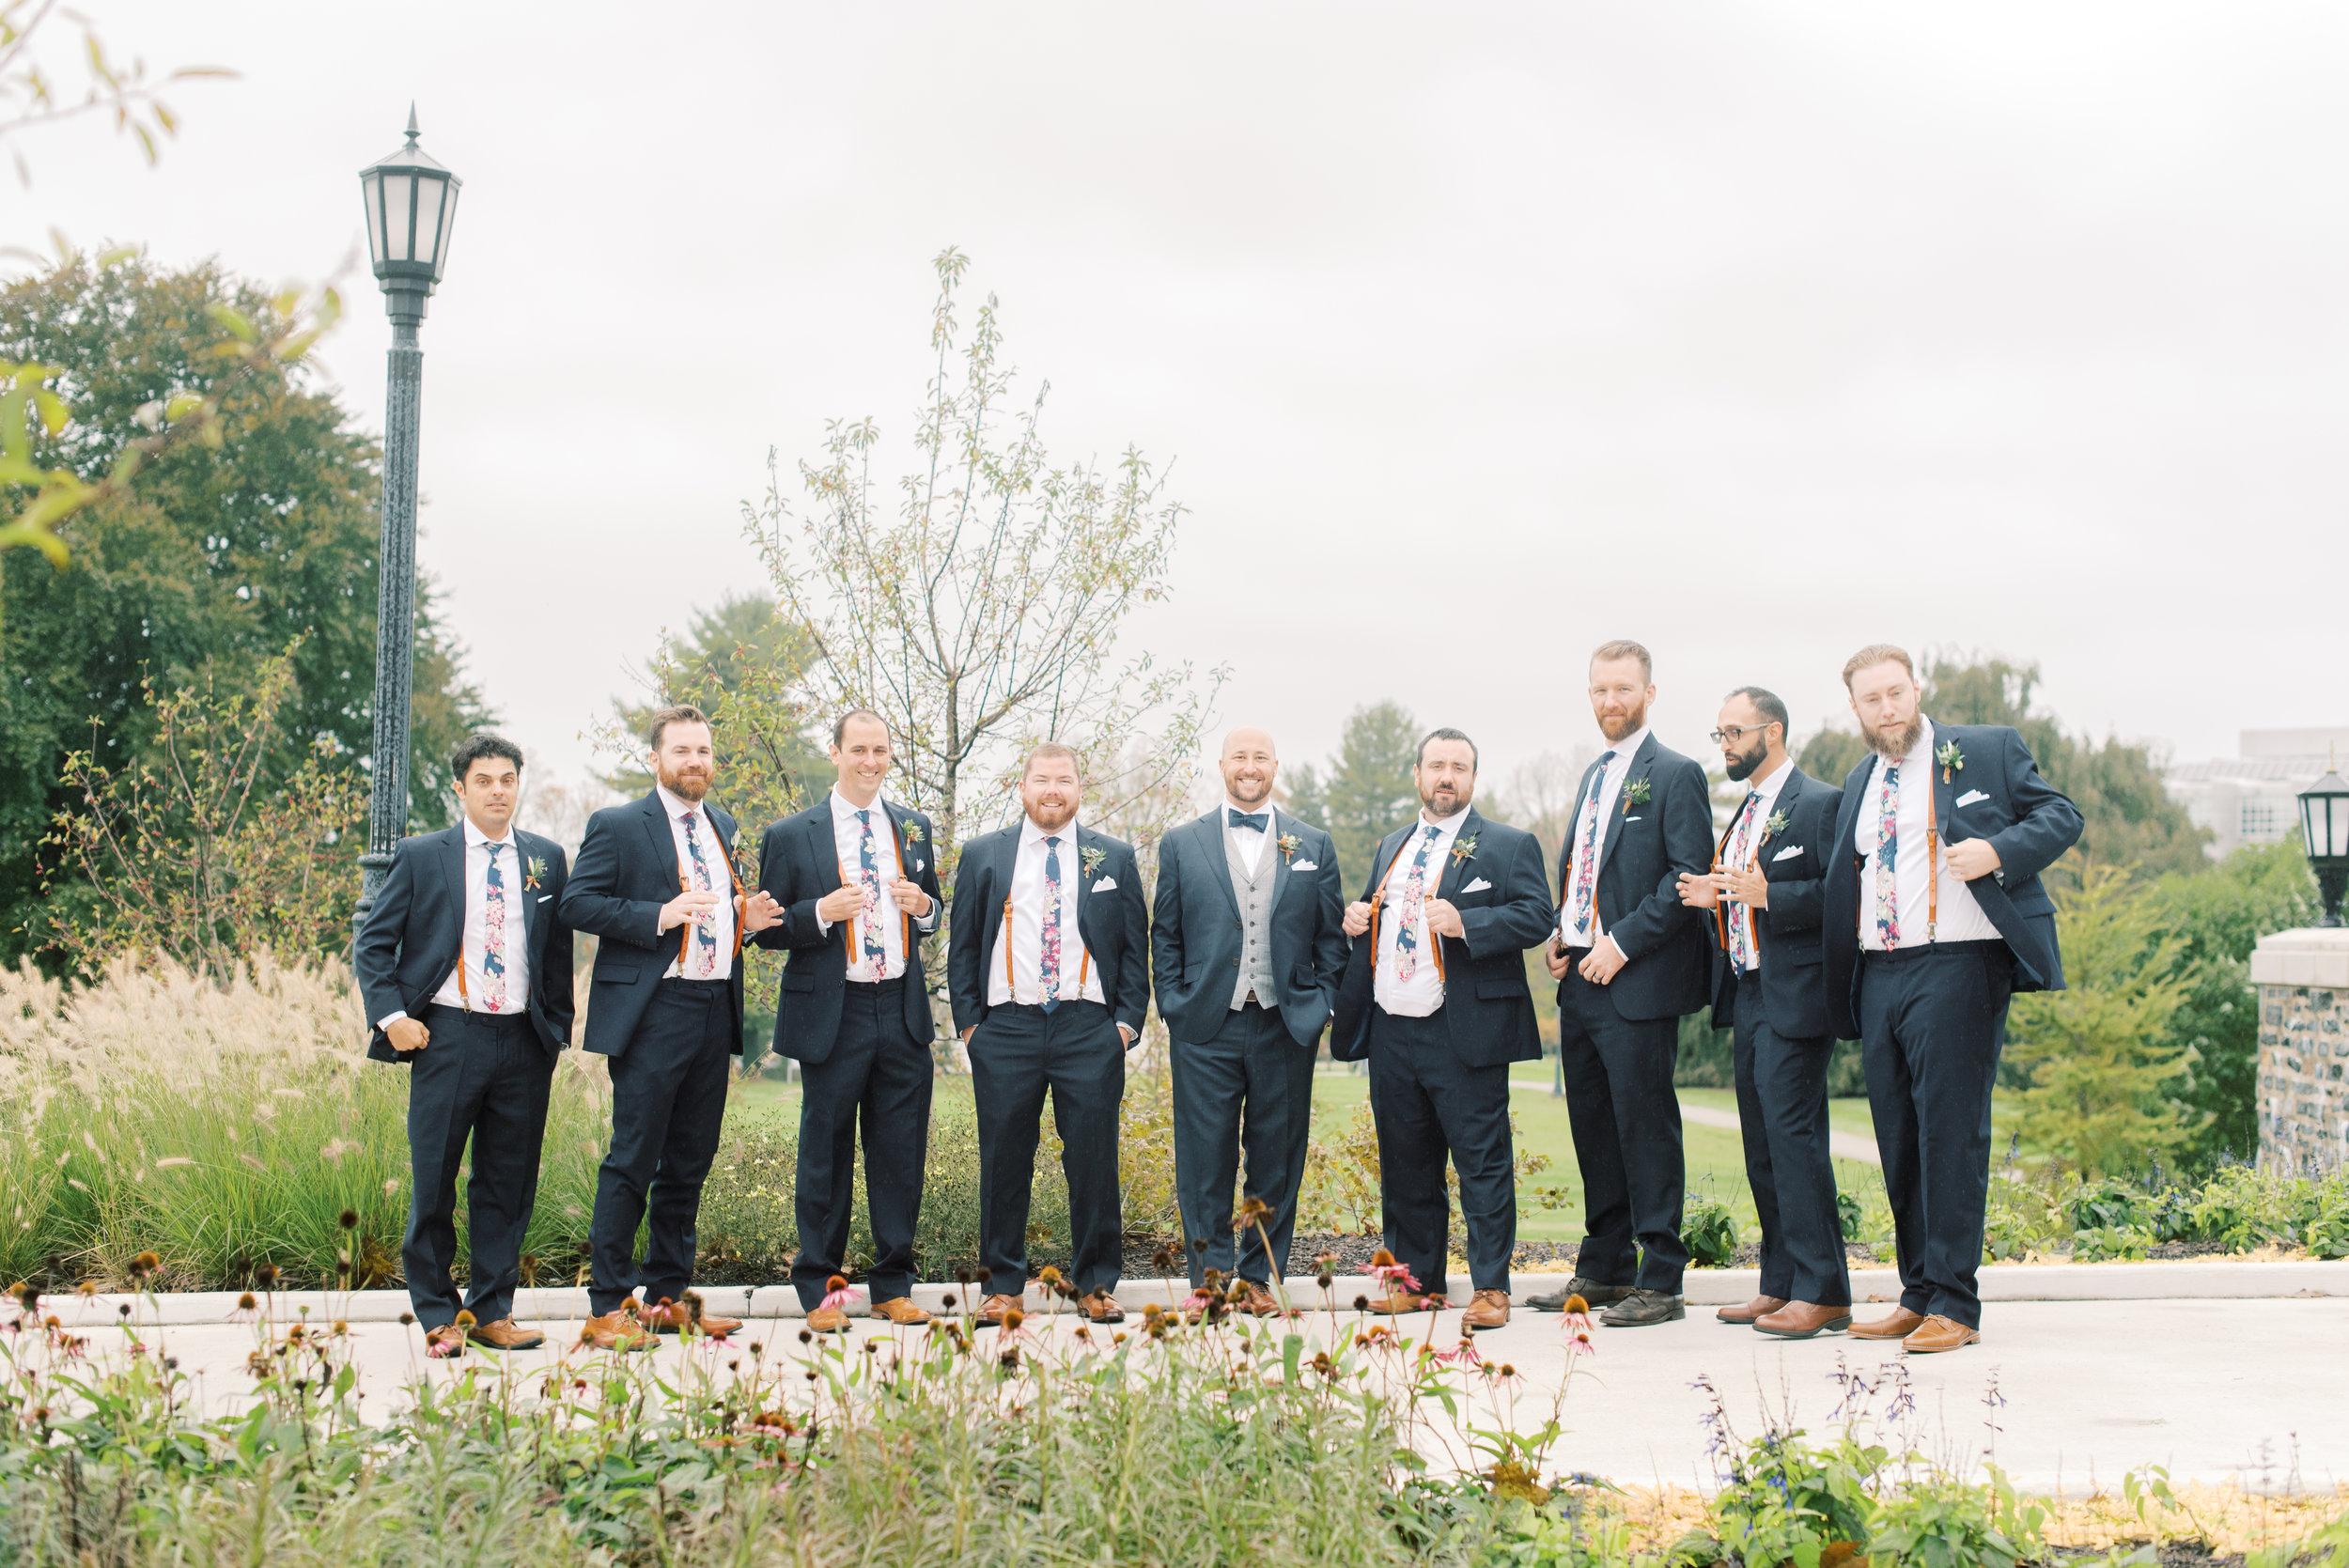 haley-richter-photography-october-pomme-wedding-in-radnor-044.jpg